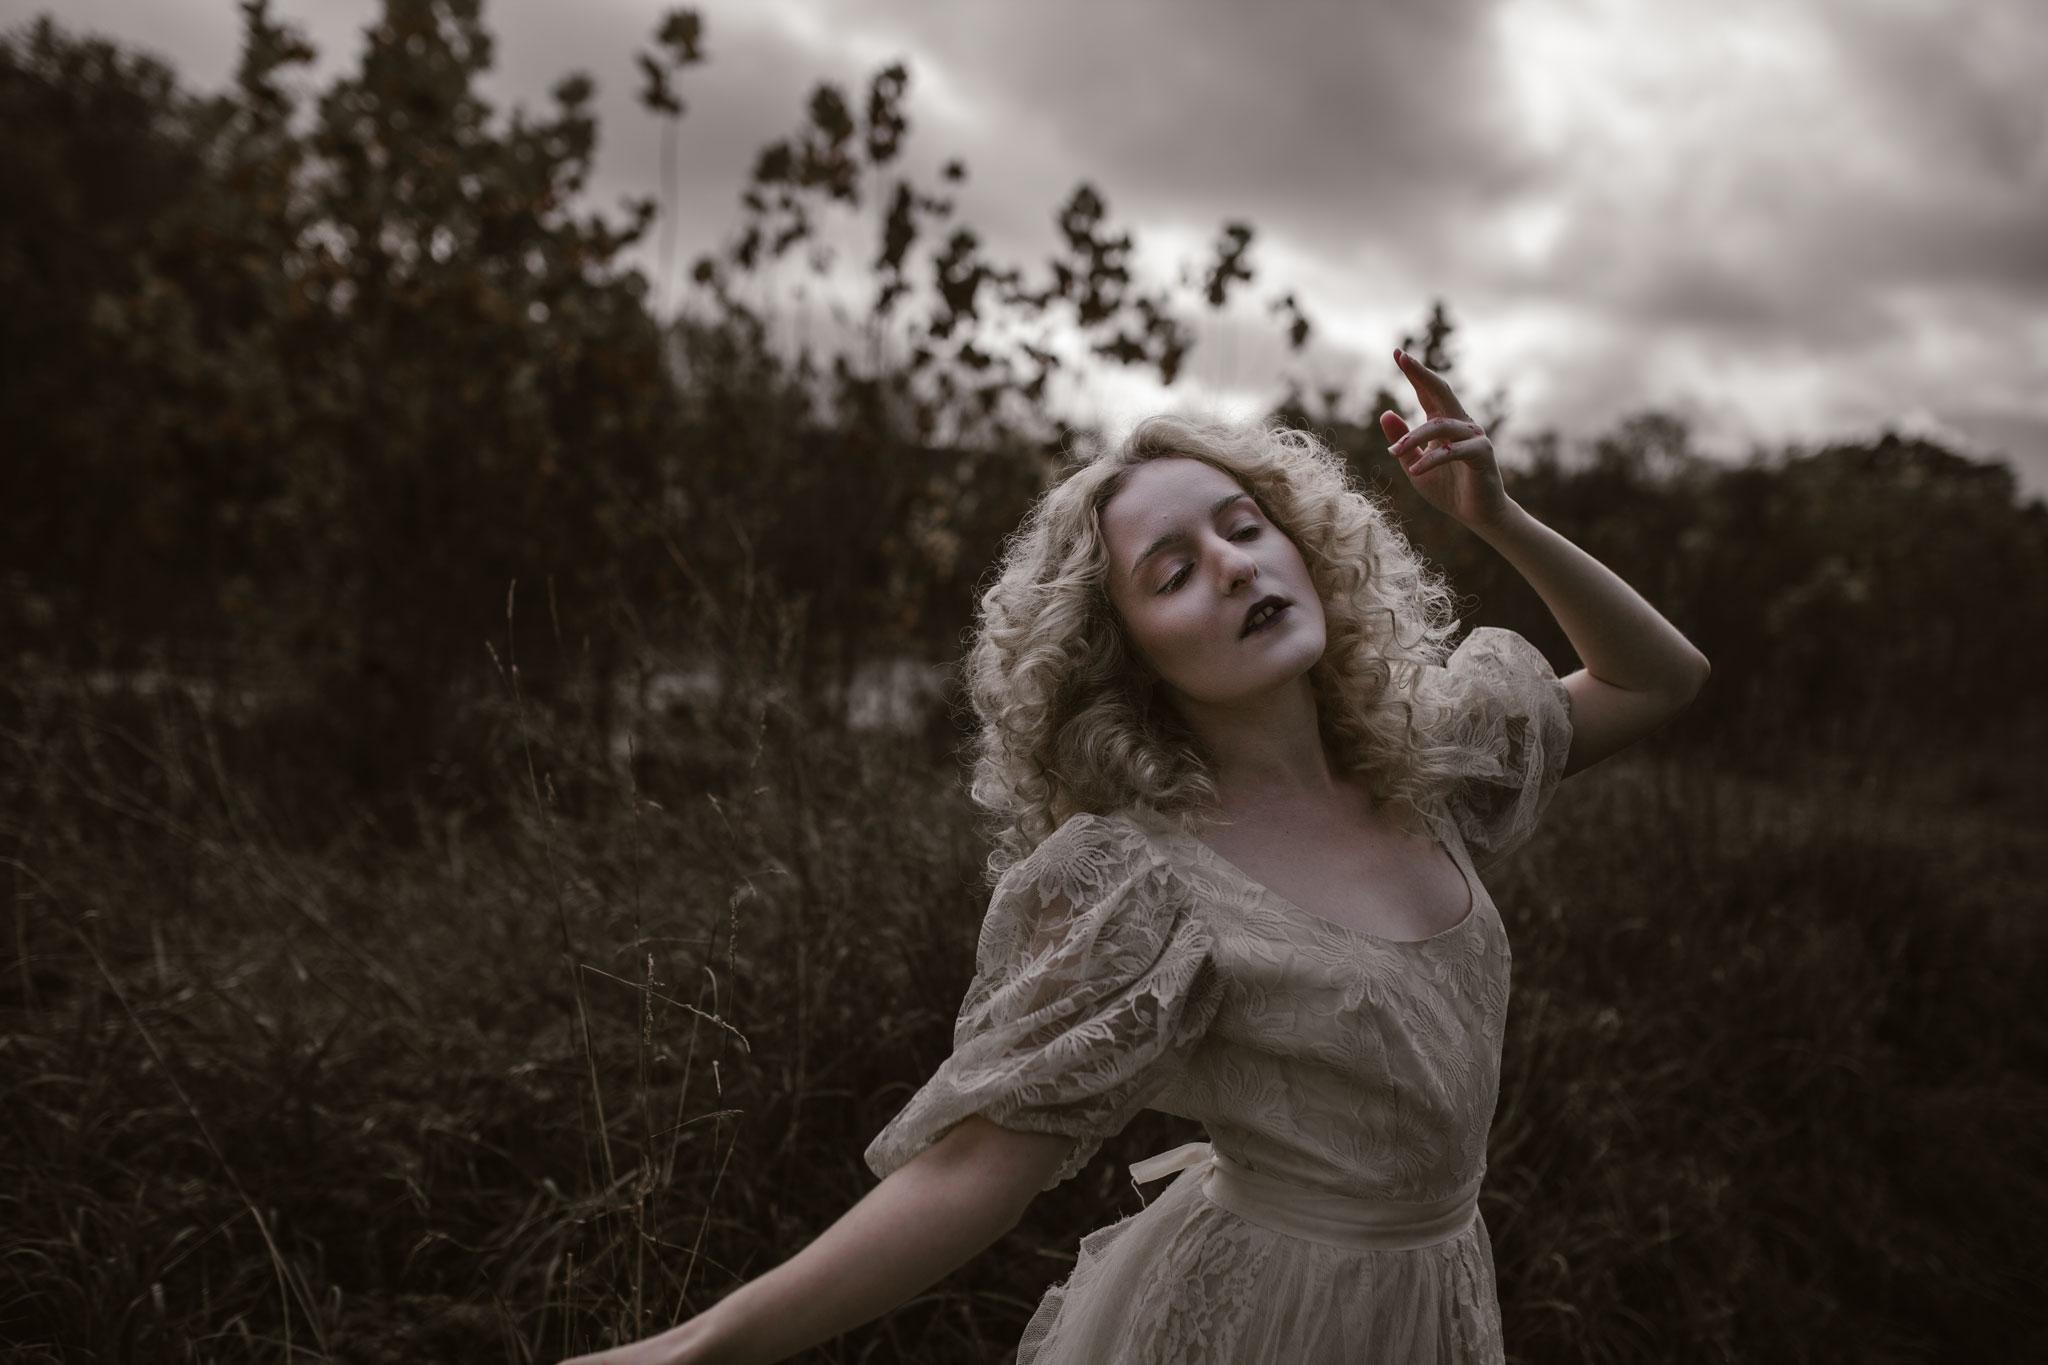 pale-witch-048fb.jpg